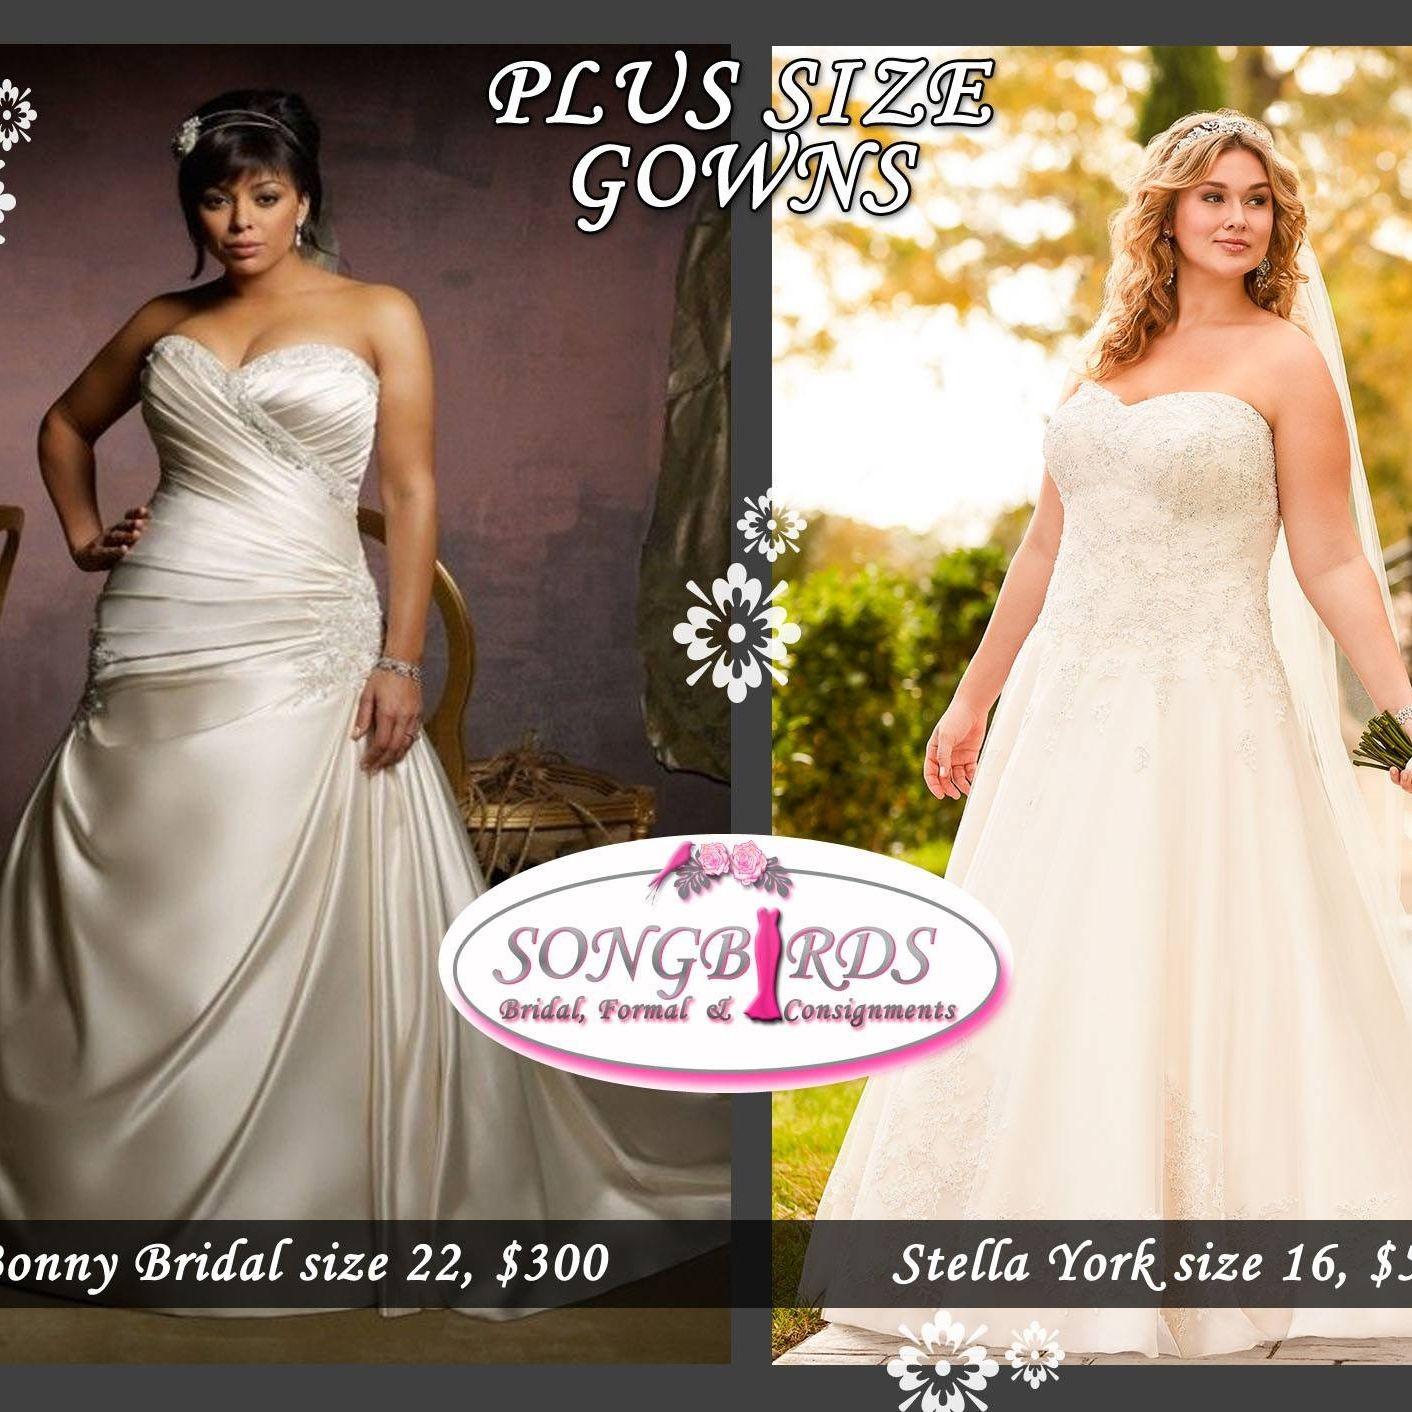 Songbirds Bridal, Formal & Consignments